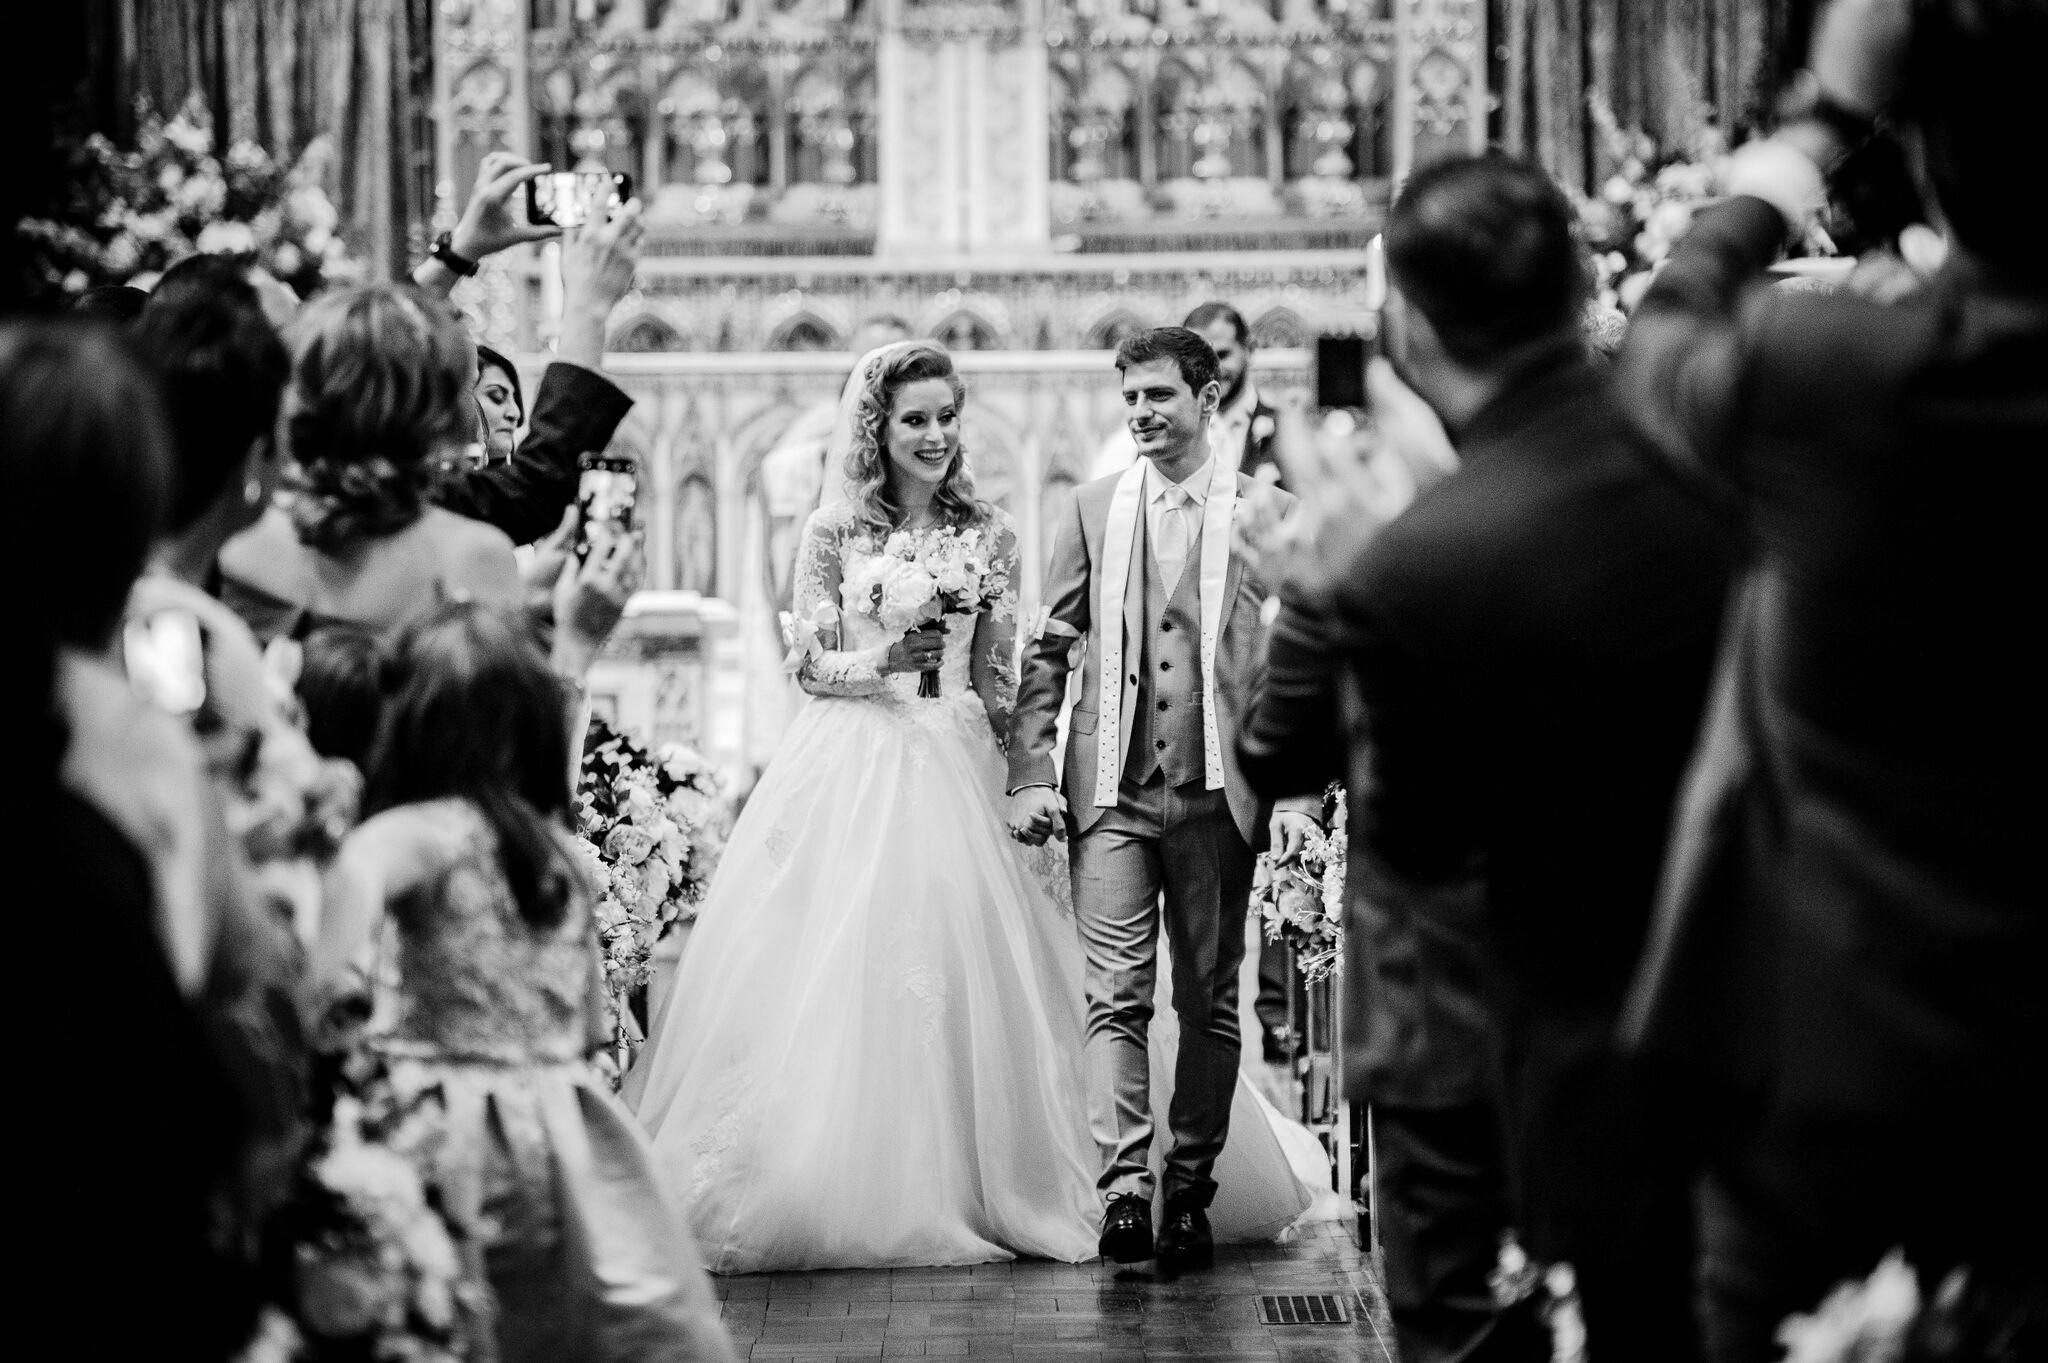 wedding day regrets -